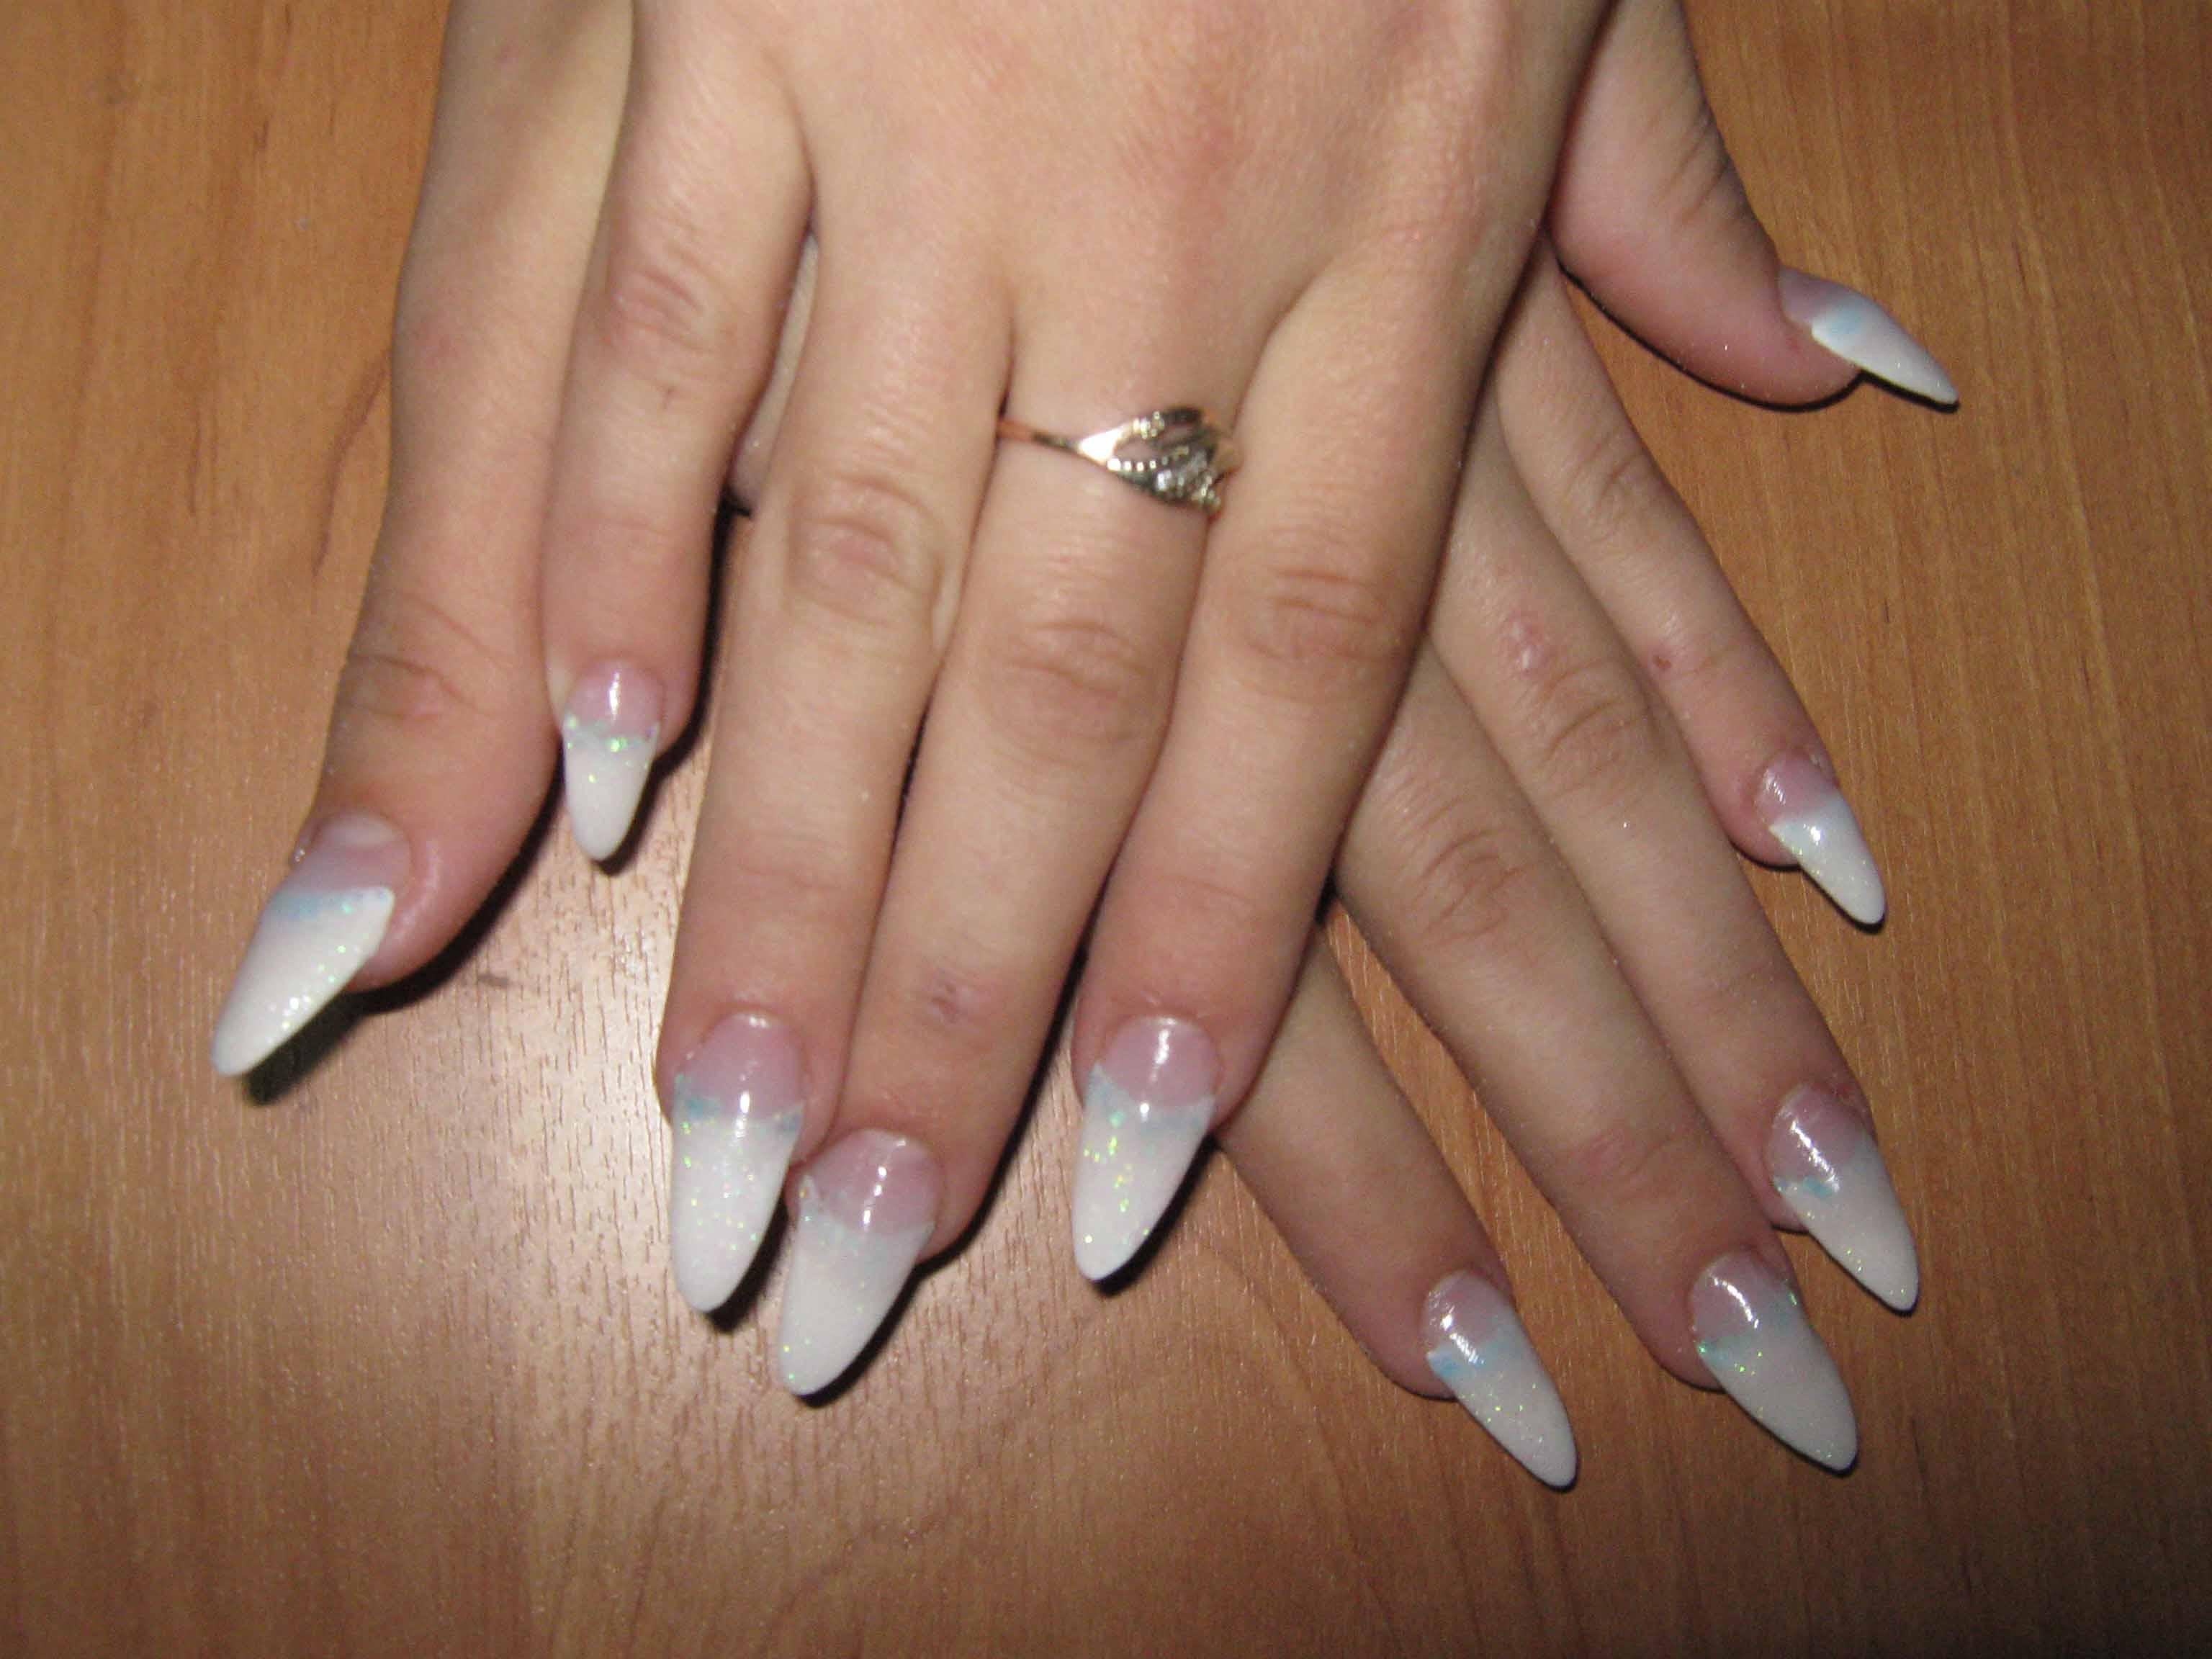 Наращивание ногтей гелем в Курске на дому - Доска объявлений 8